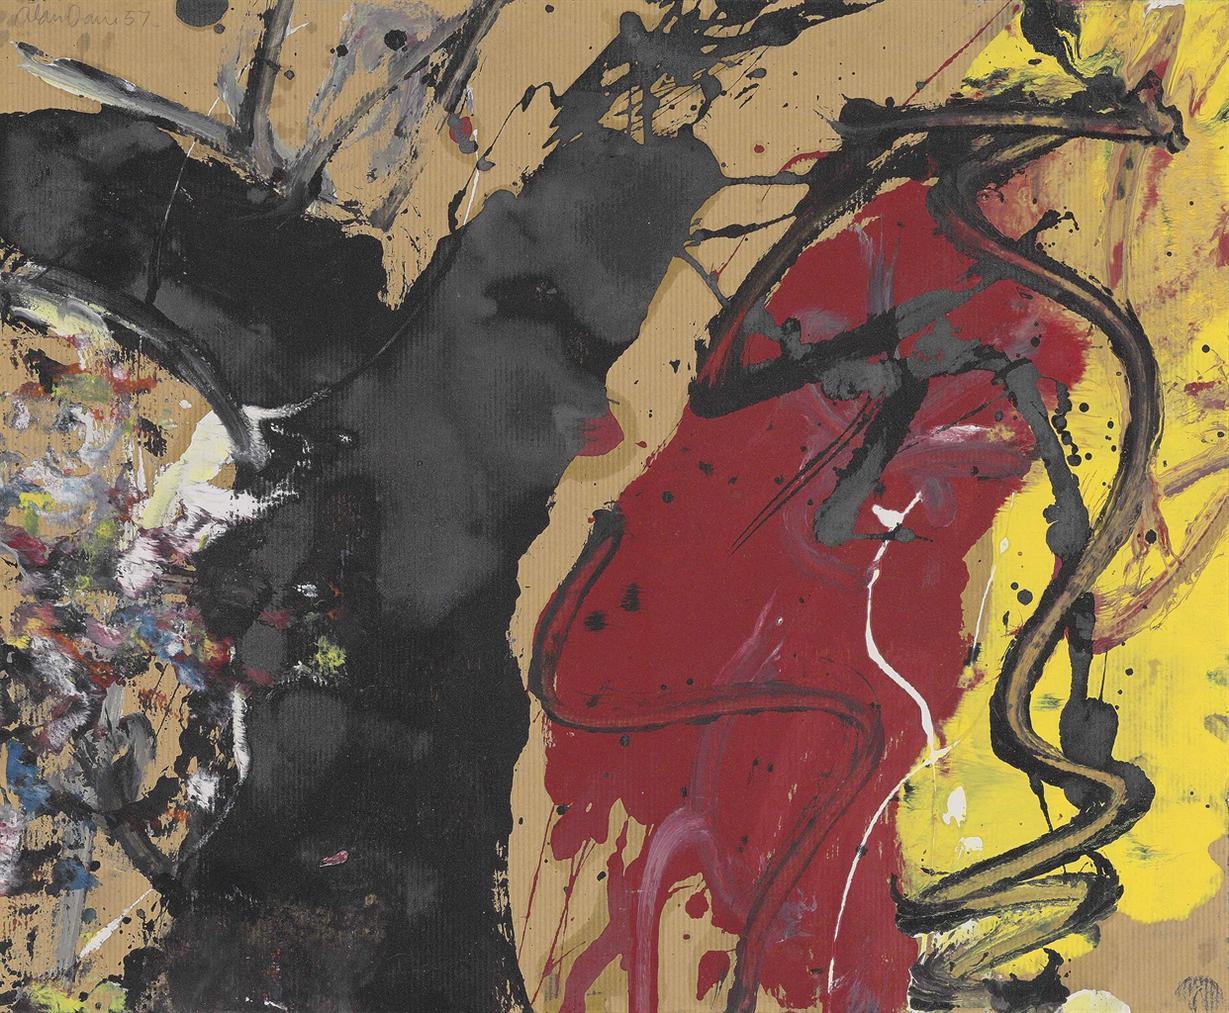 Alan Davie-Composition 1957-1957